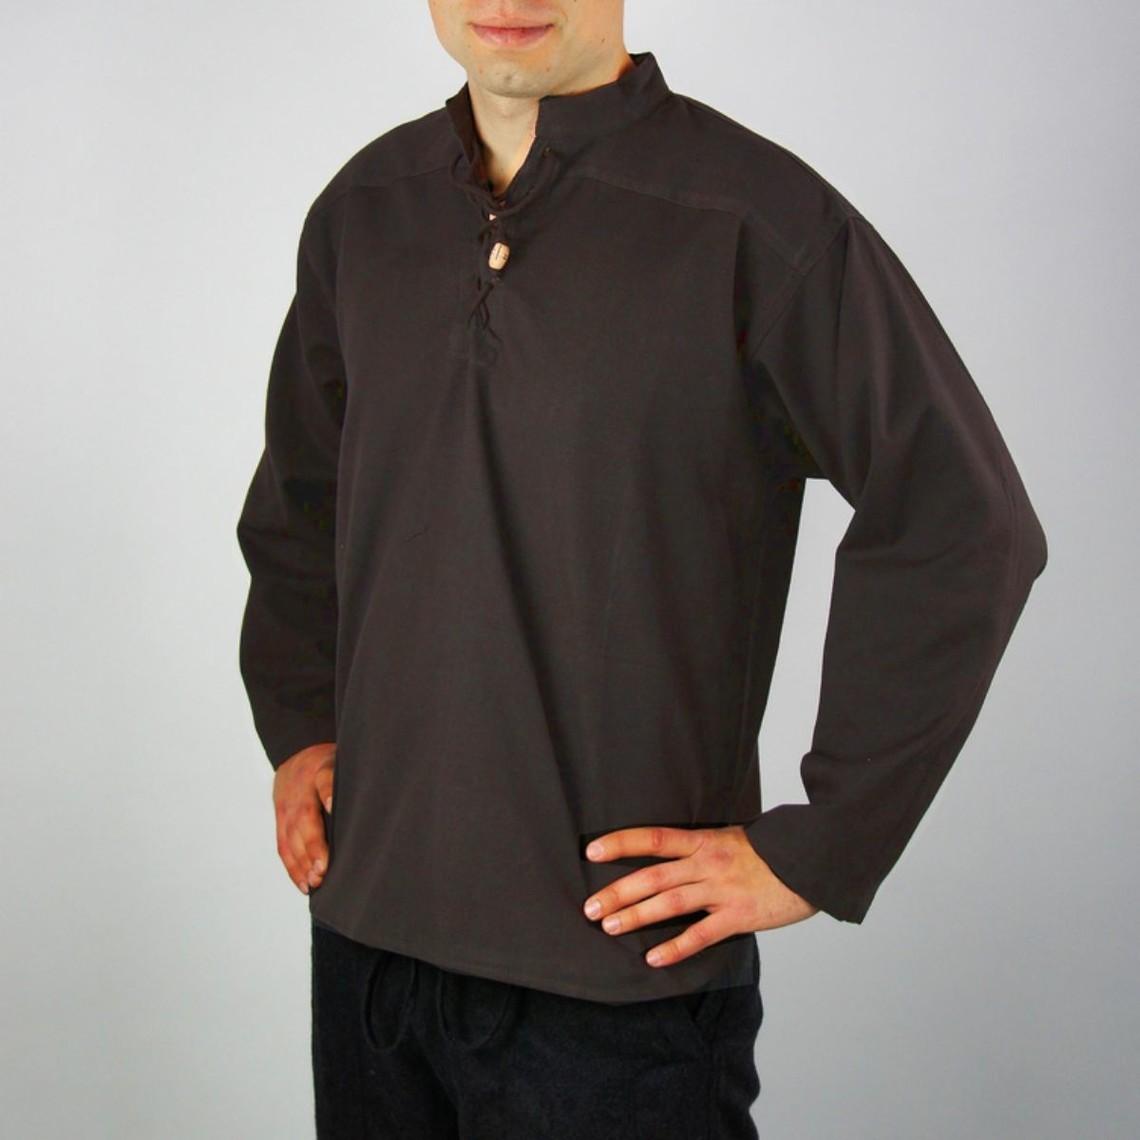 Leonardo Carbone Handgeweven hemd, donkerbruin